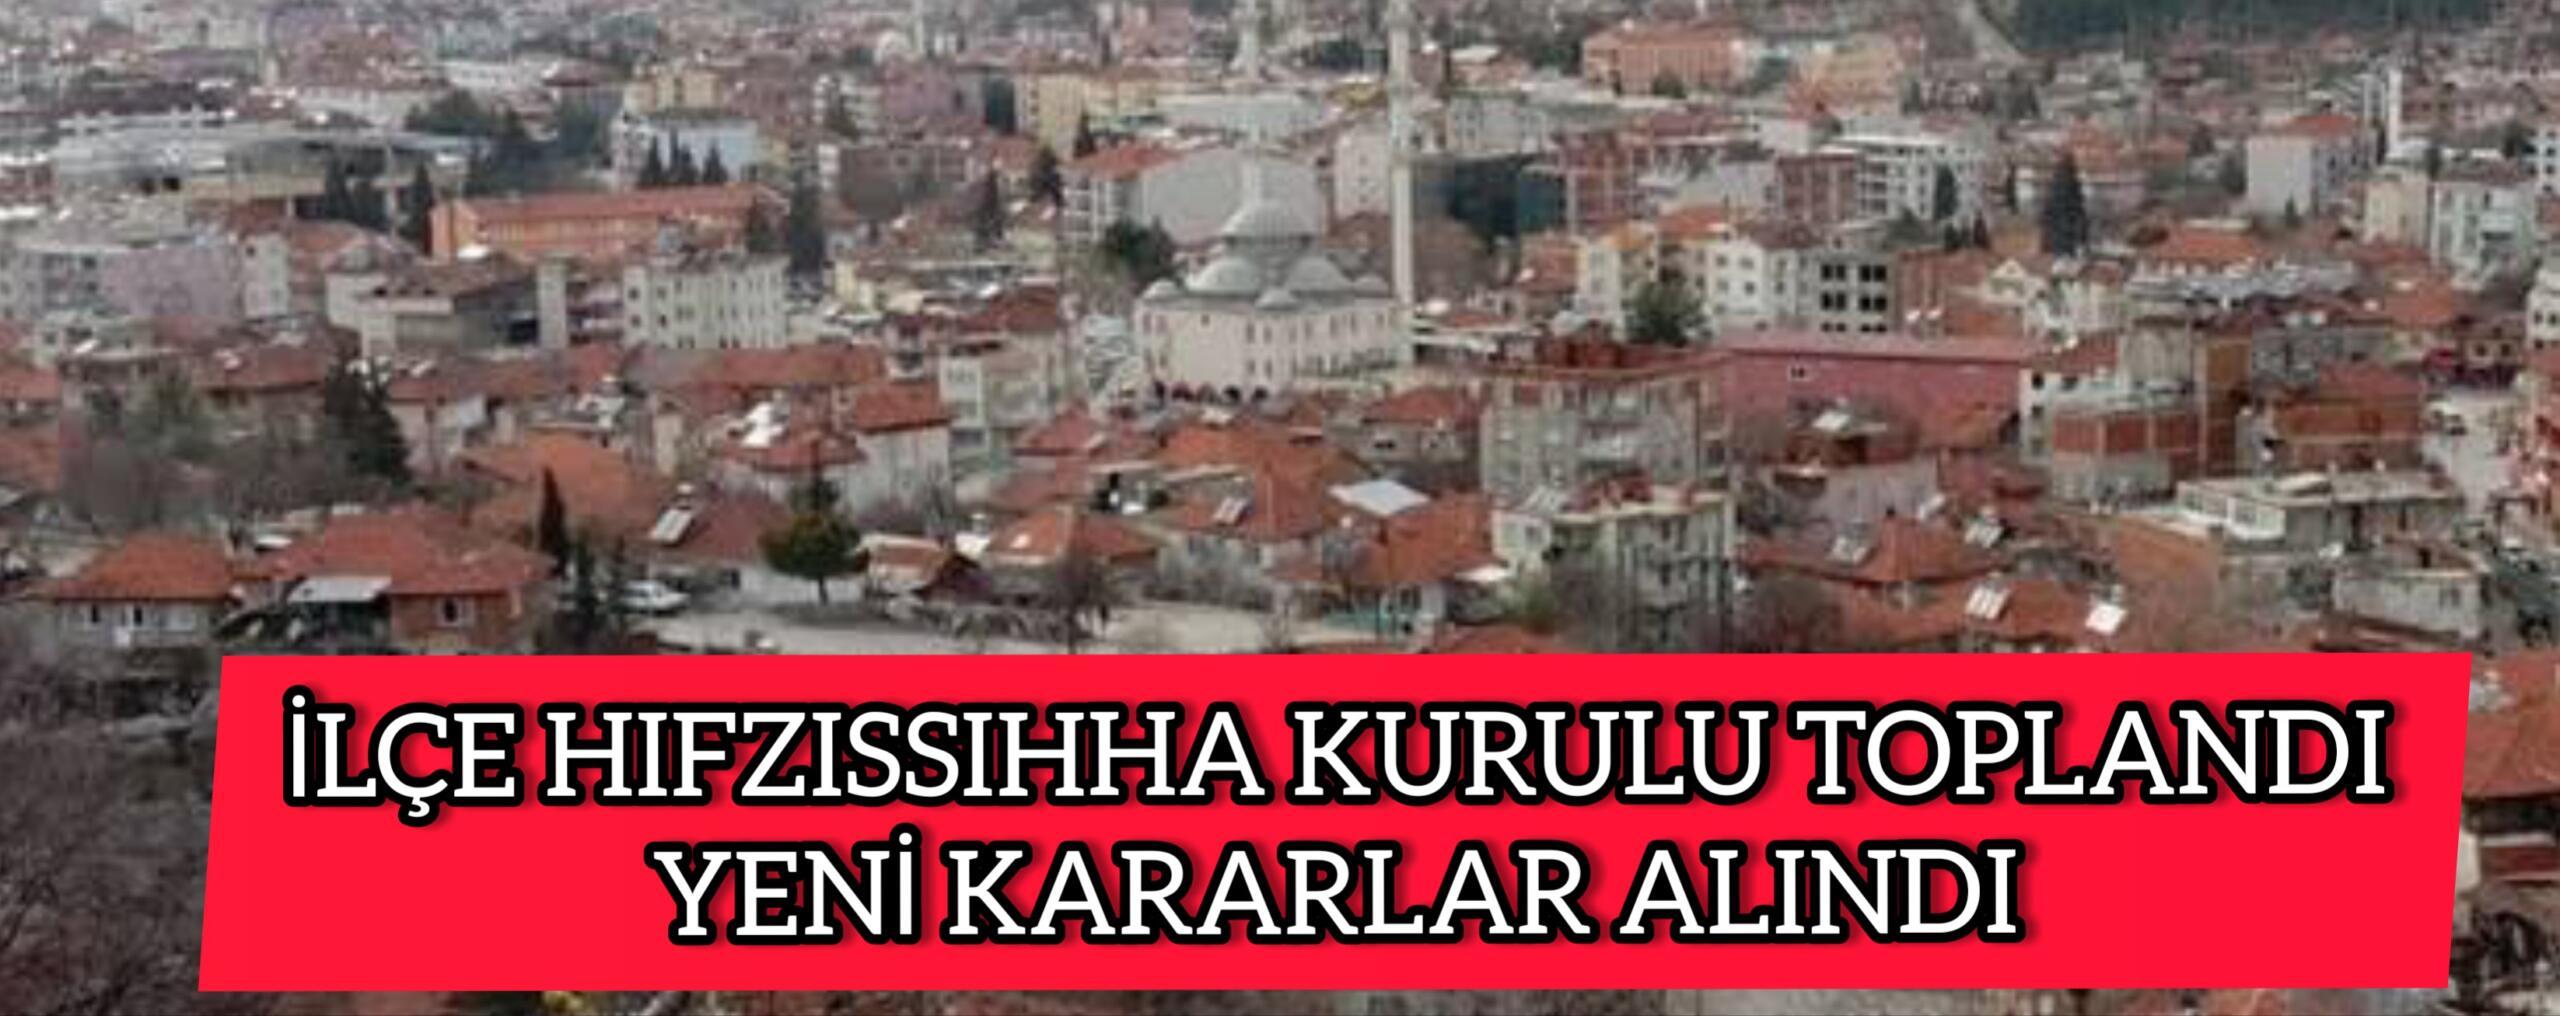 İLÇE HIFZISSIHHA KURULU TOPLANDI YENİ KARARLAR ALINDI